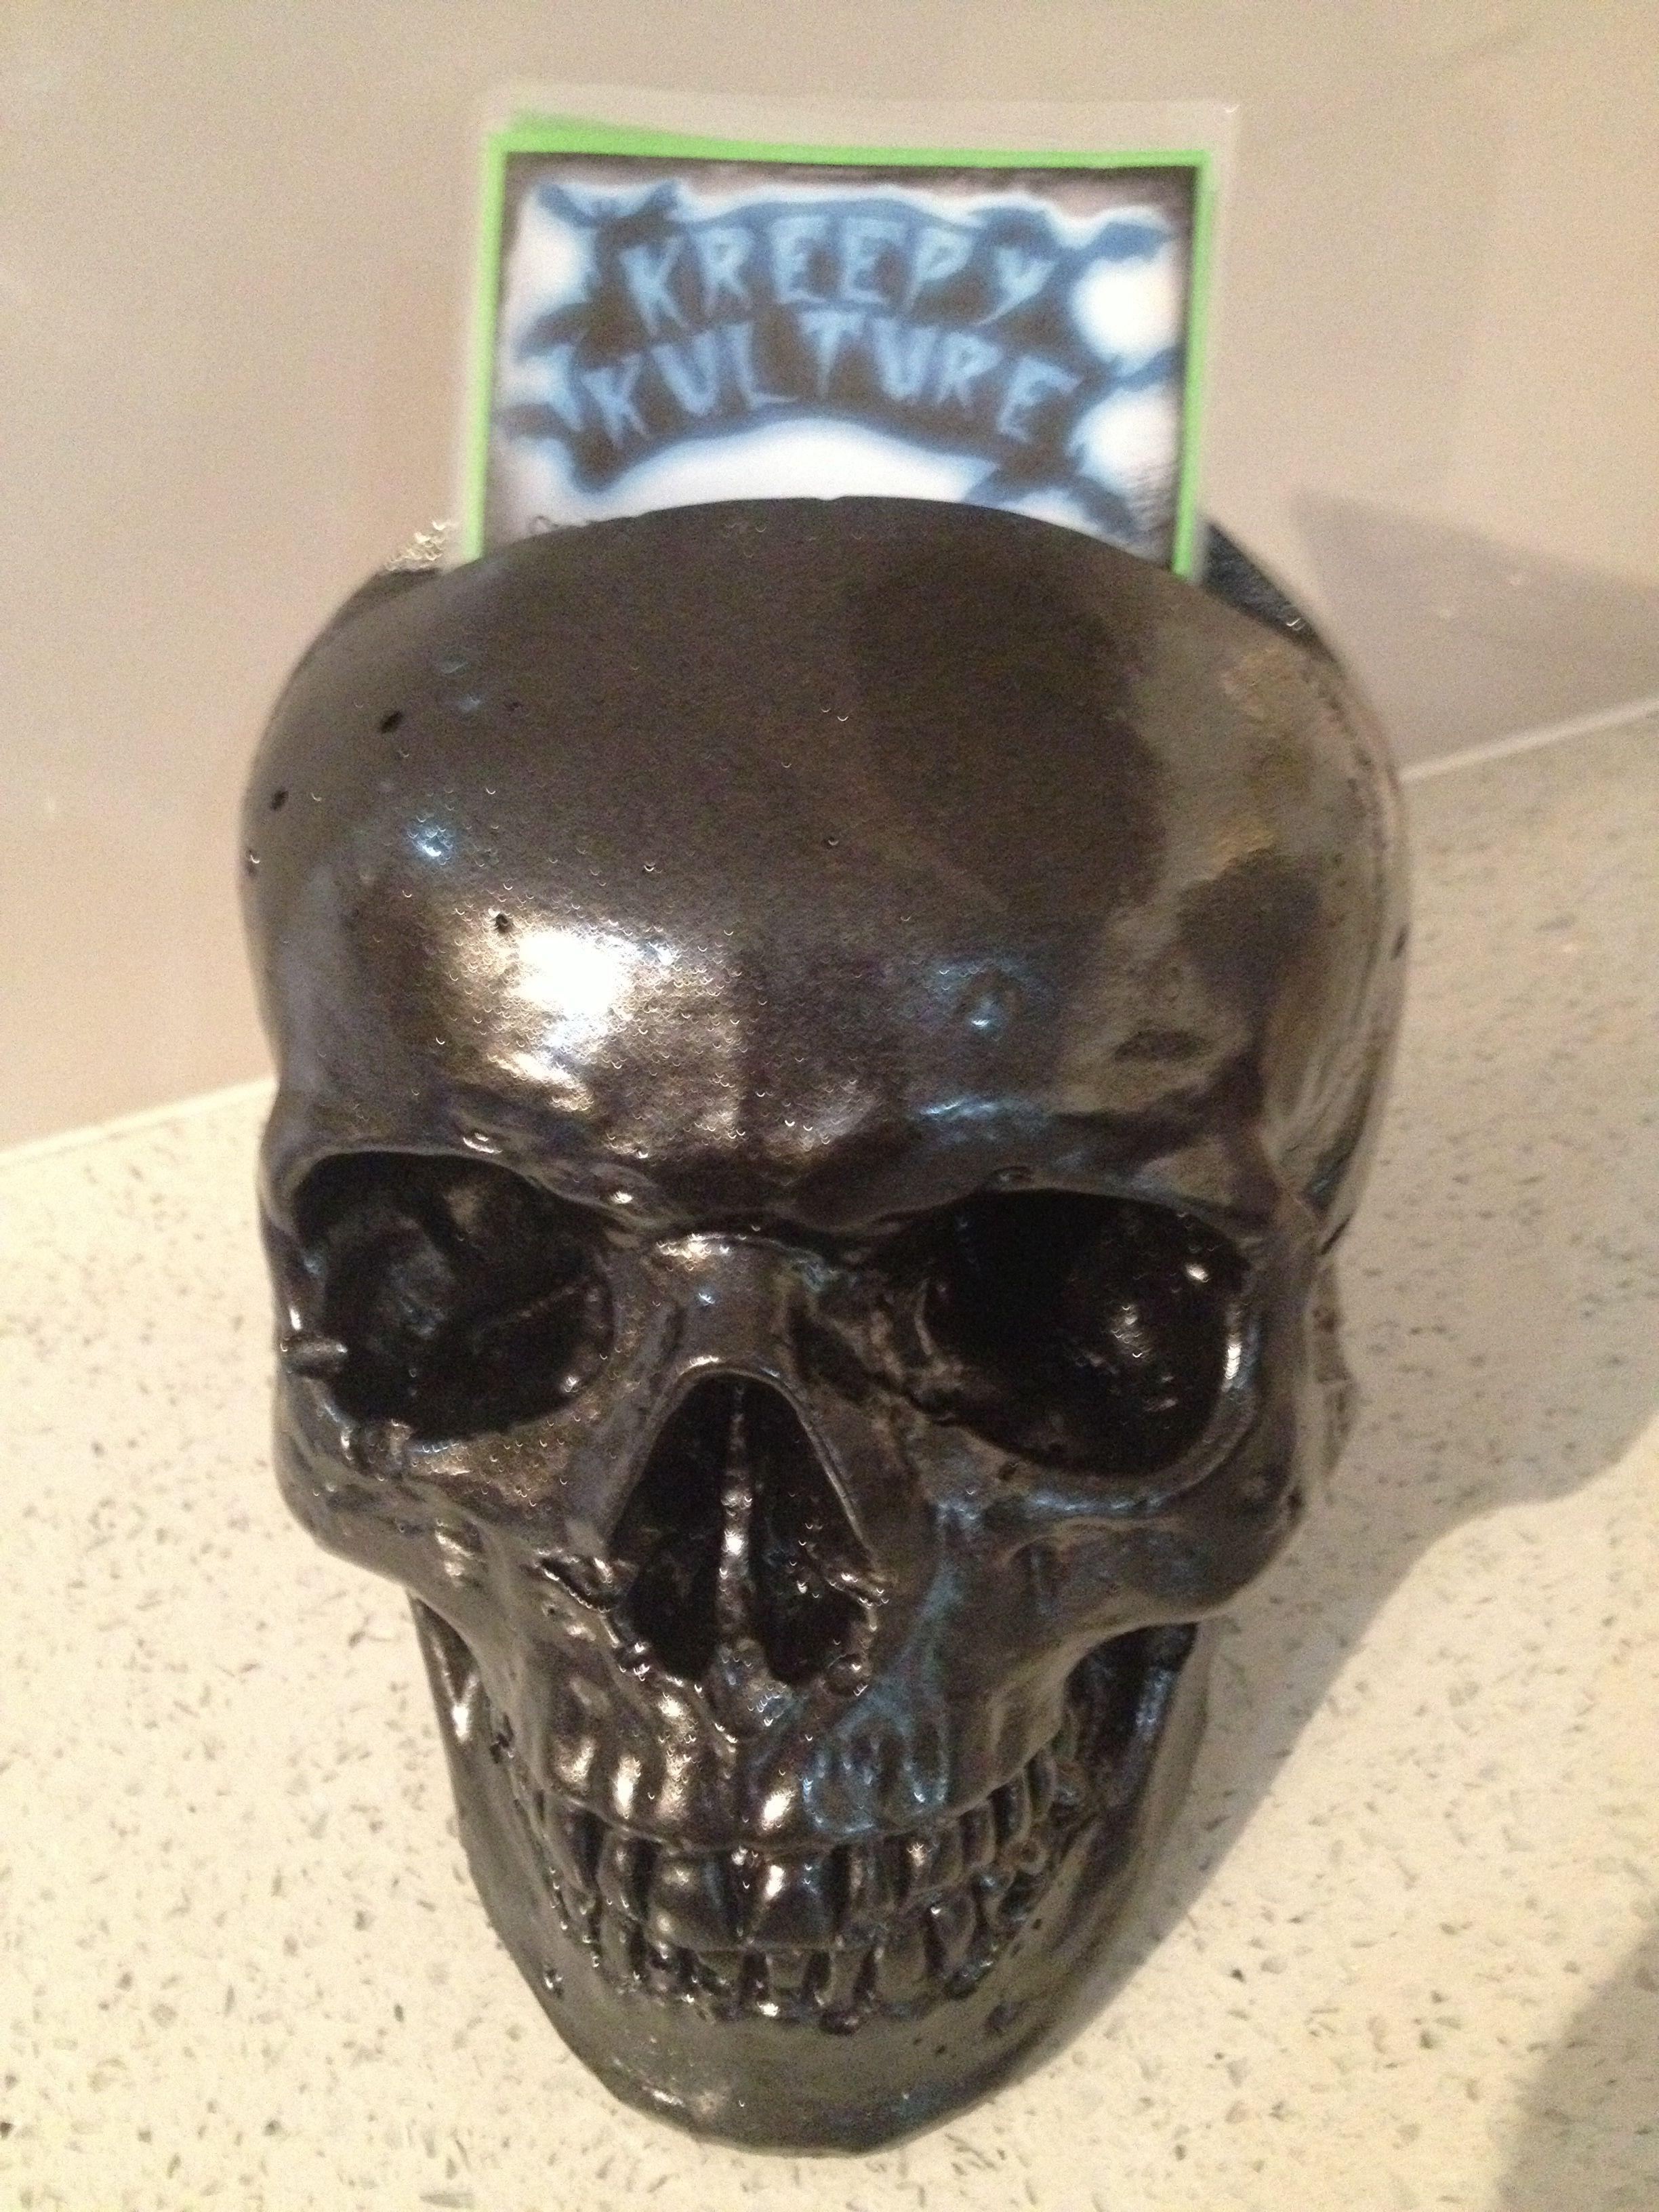 Kreepy kulture skull business card holder wedding ideas kreepy kulture skull business card holder magicingreecefo Choice Image